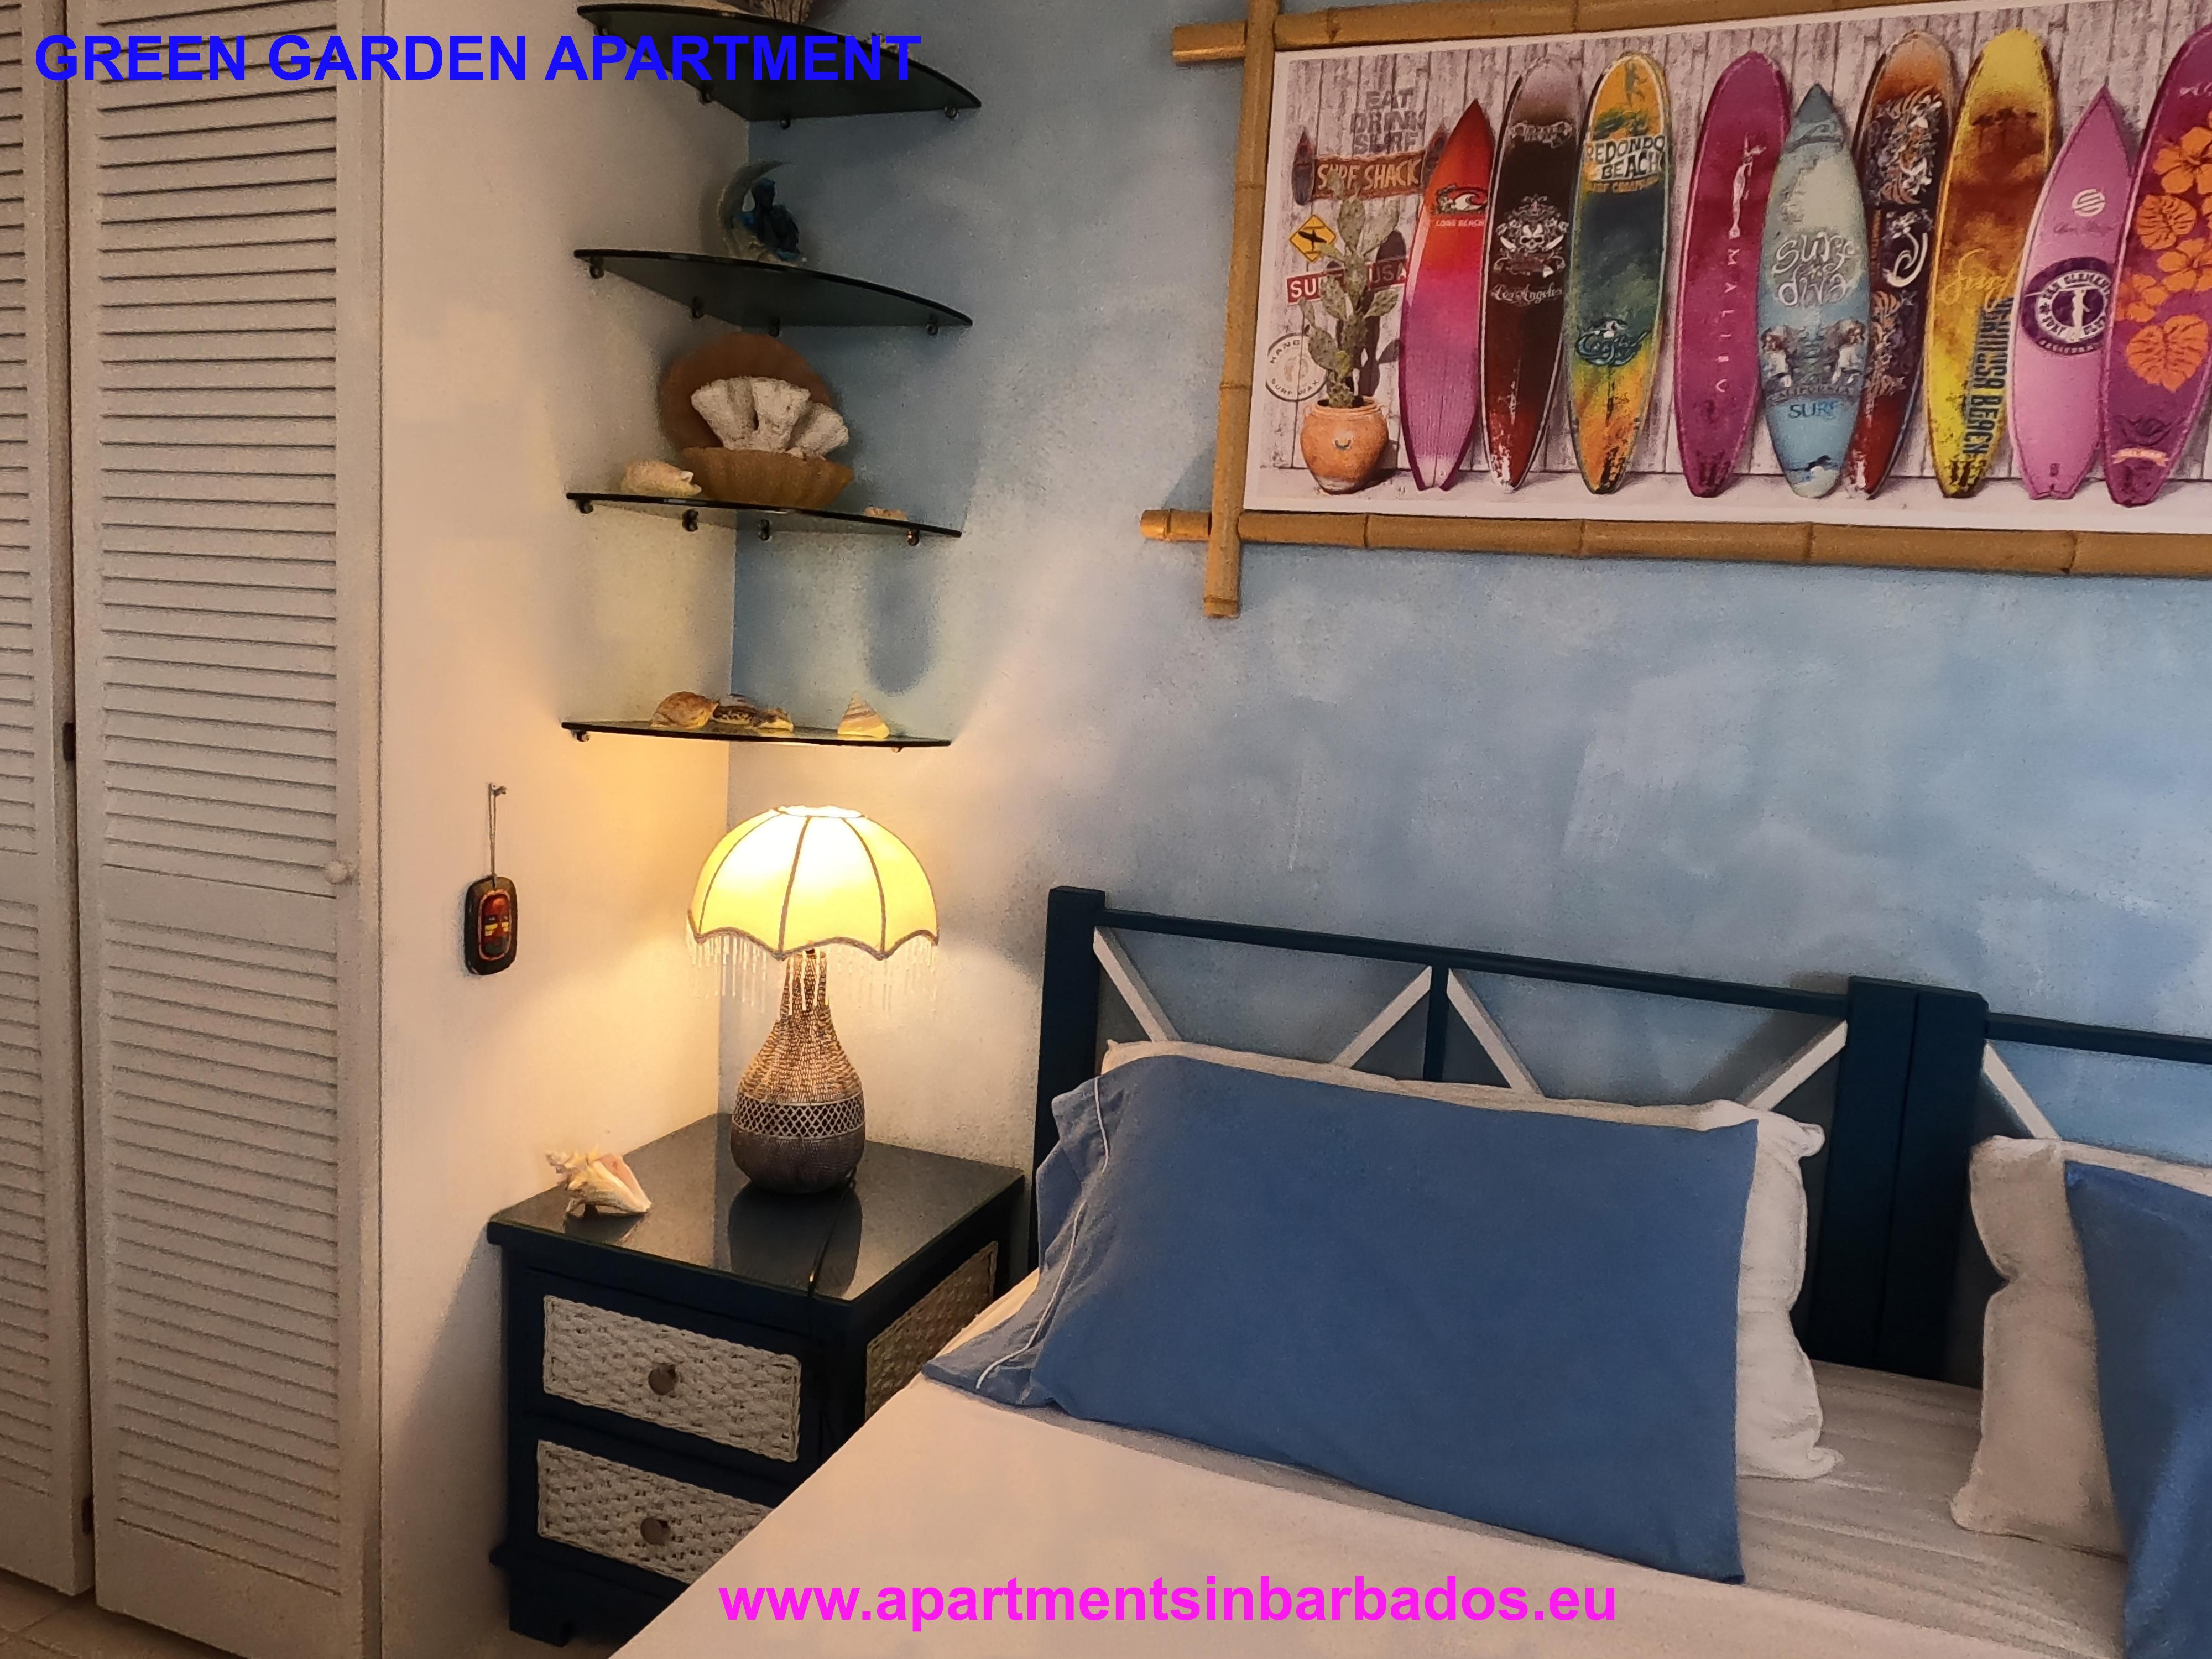 Green Garden Apartment - Details